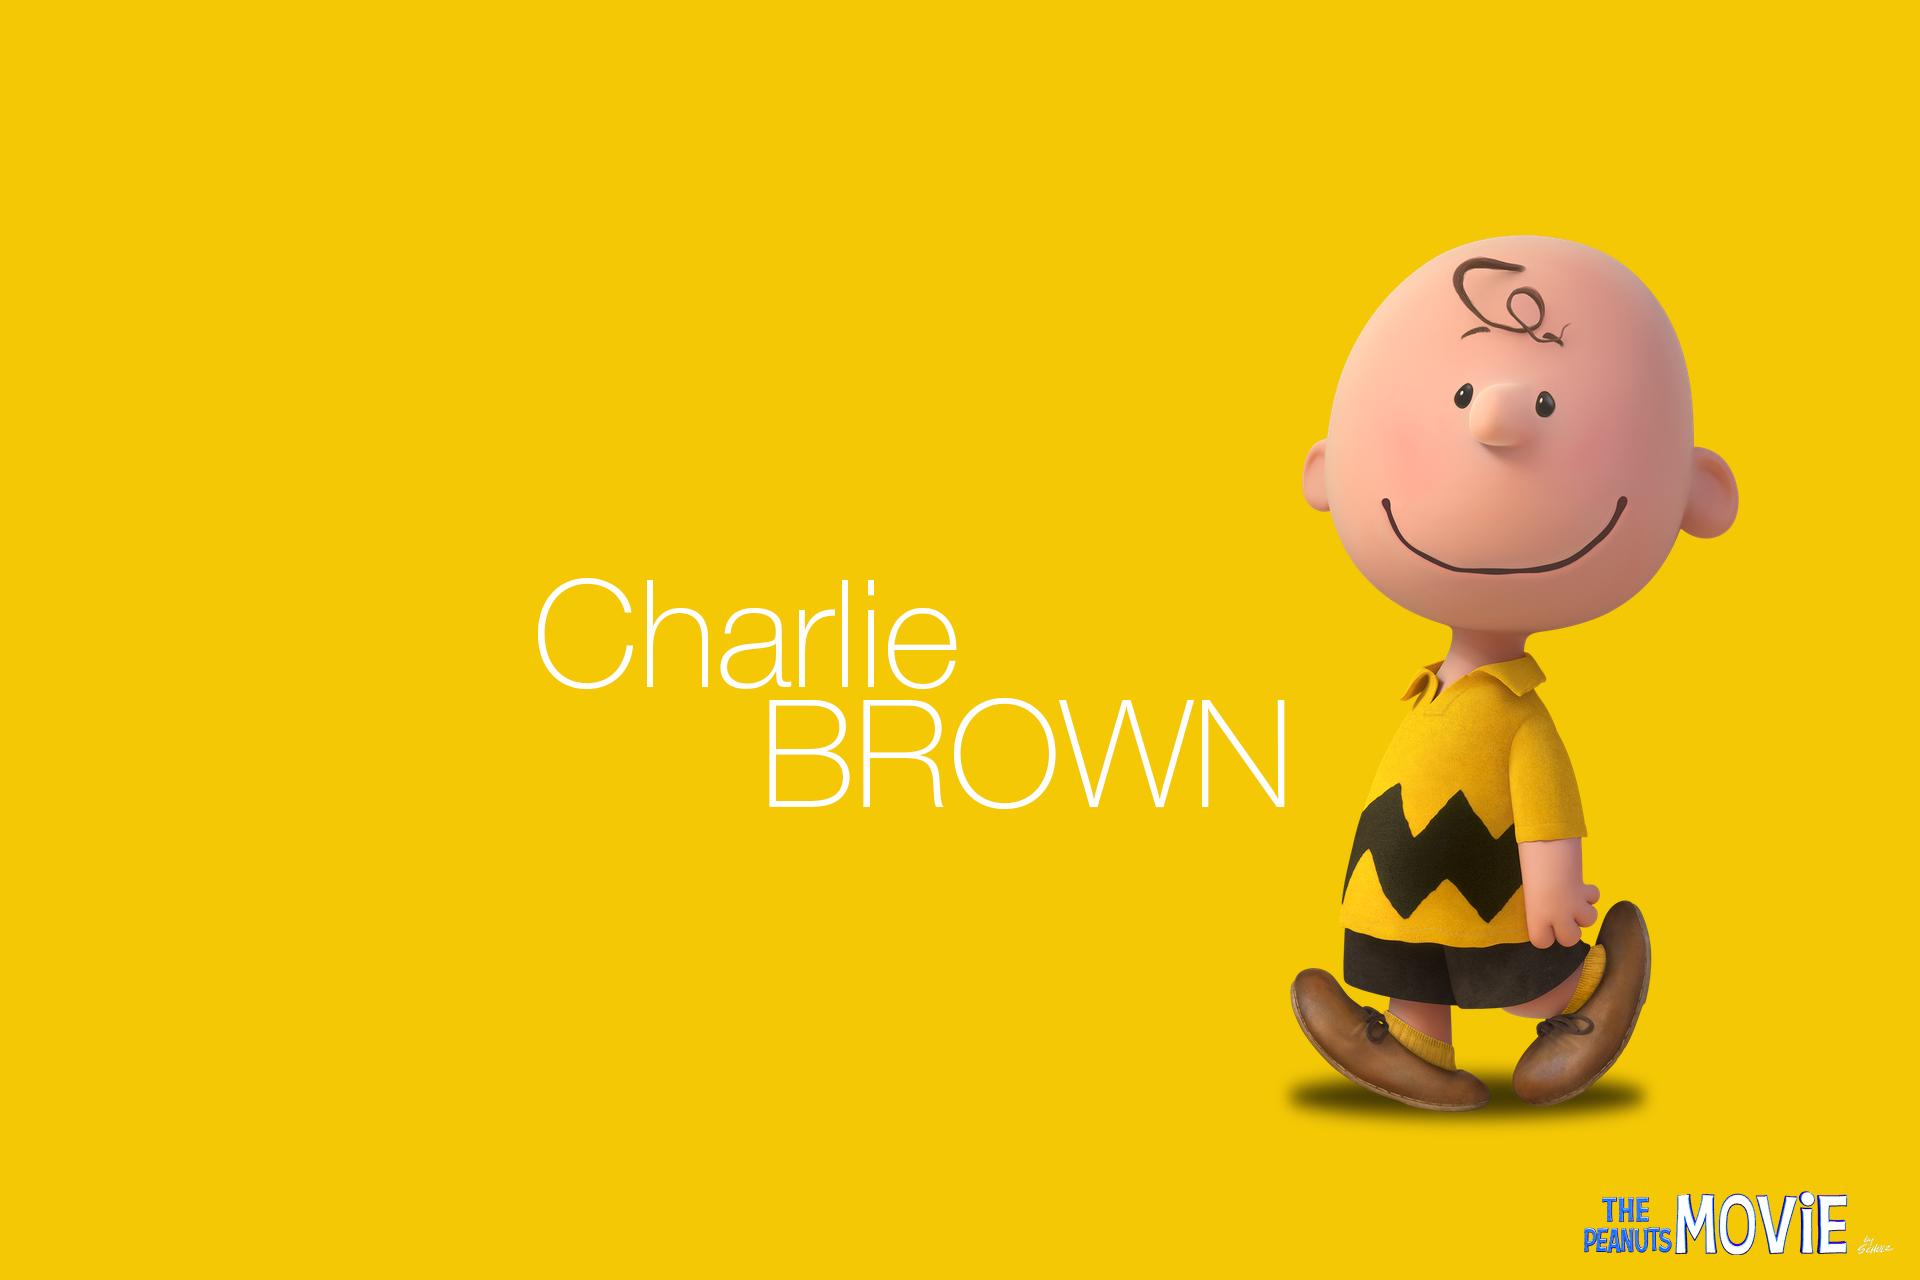 Charlie Brown Wallpaper 1920x1280